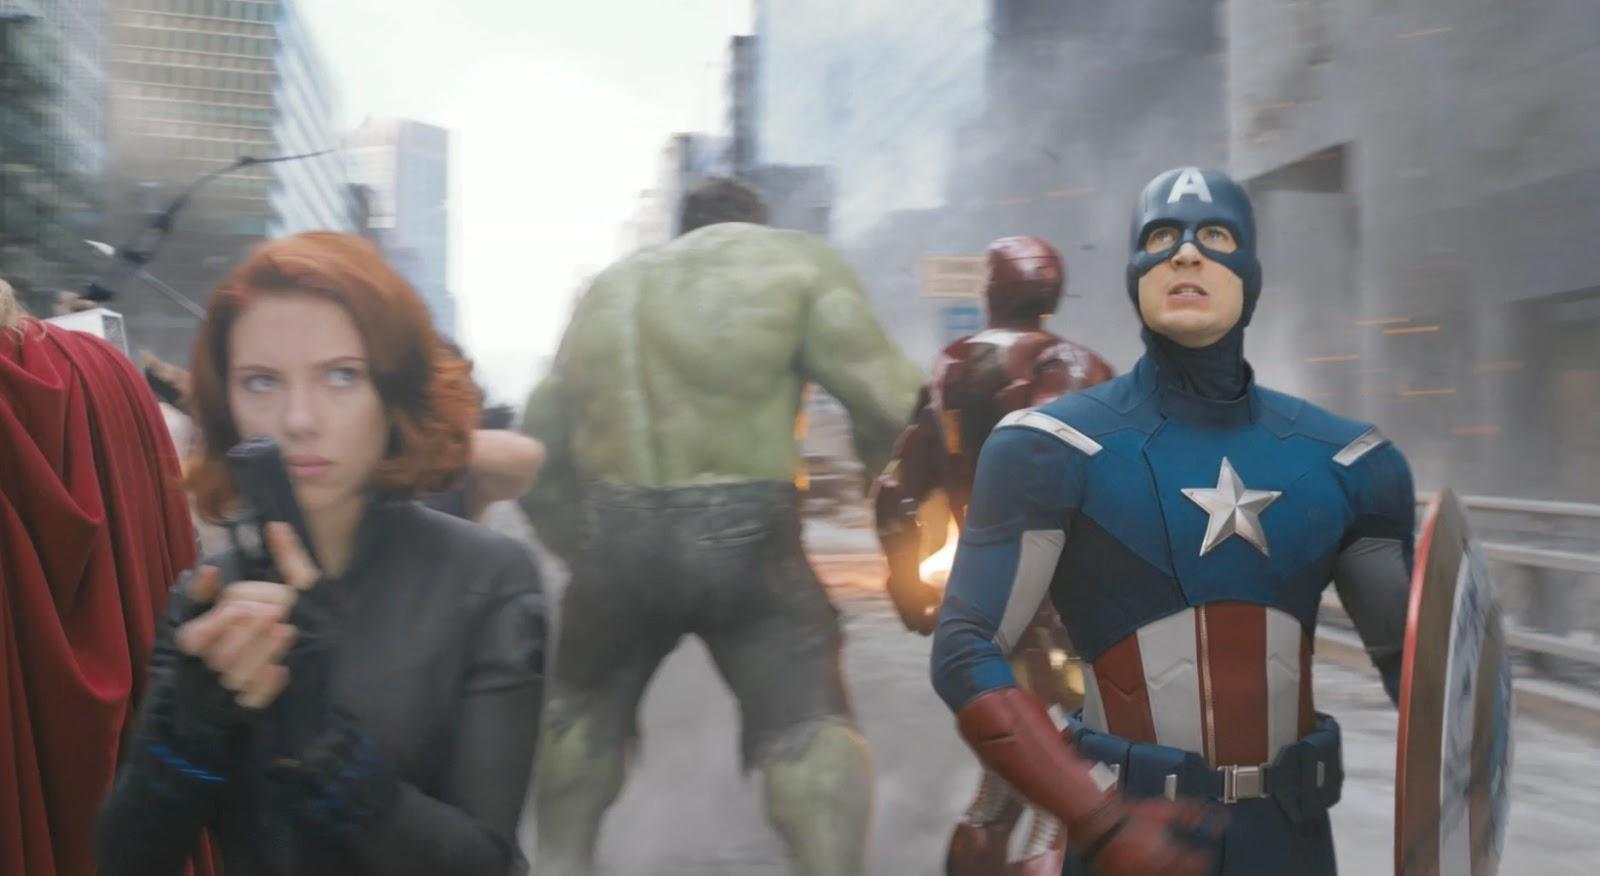 Scarlett Johansson Avengers HD desktop wallpaper High  - the avengers scarlett johansson wallpapers